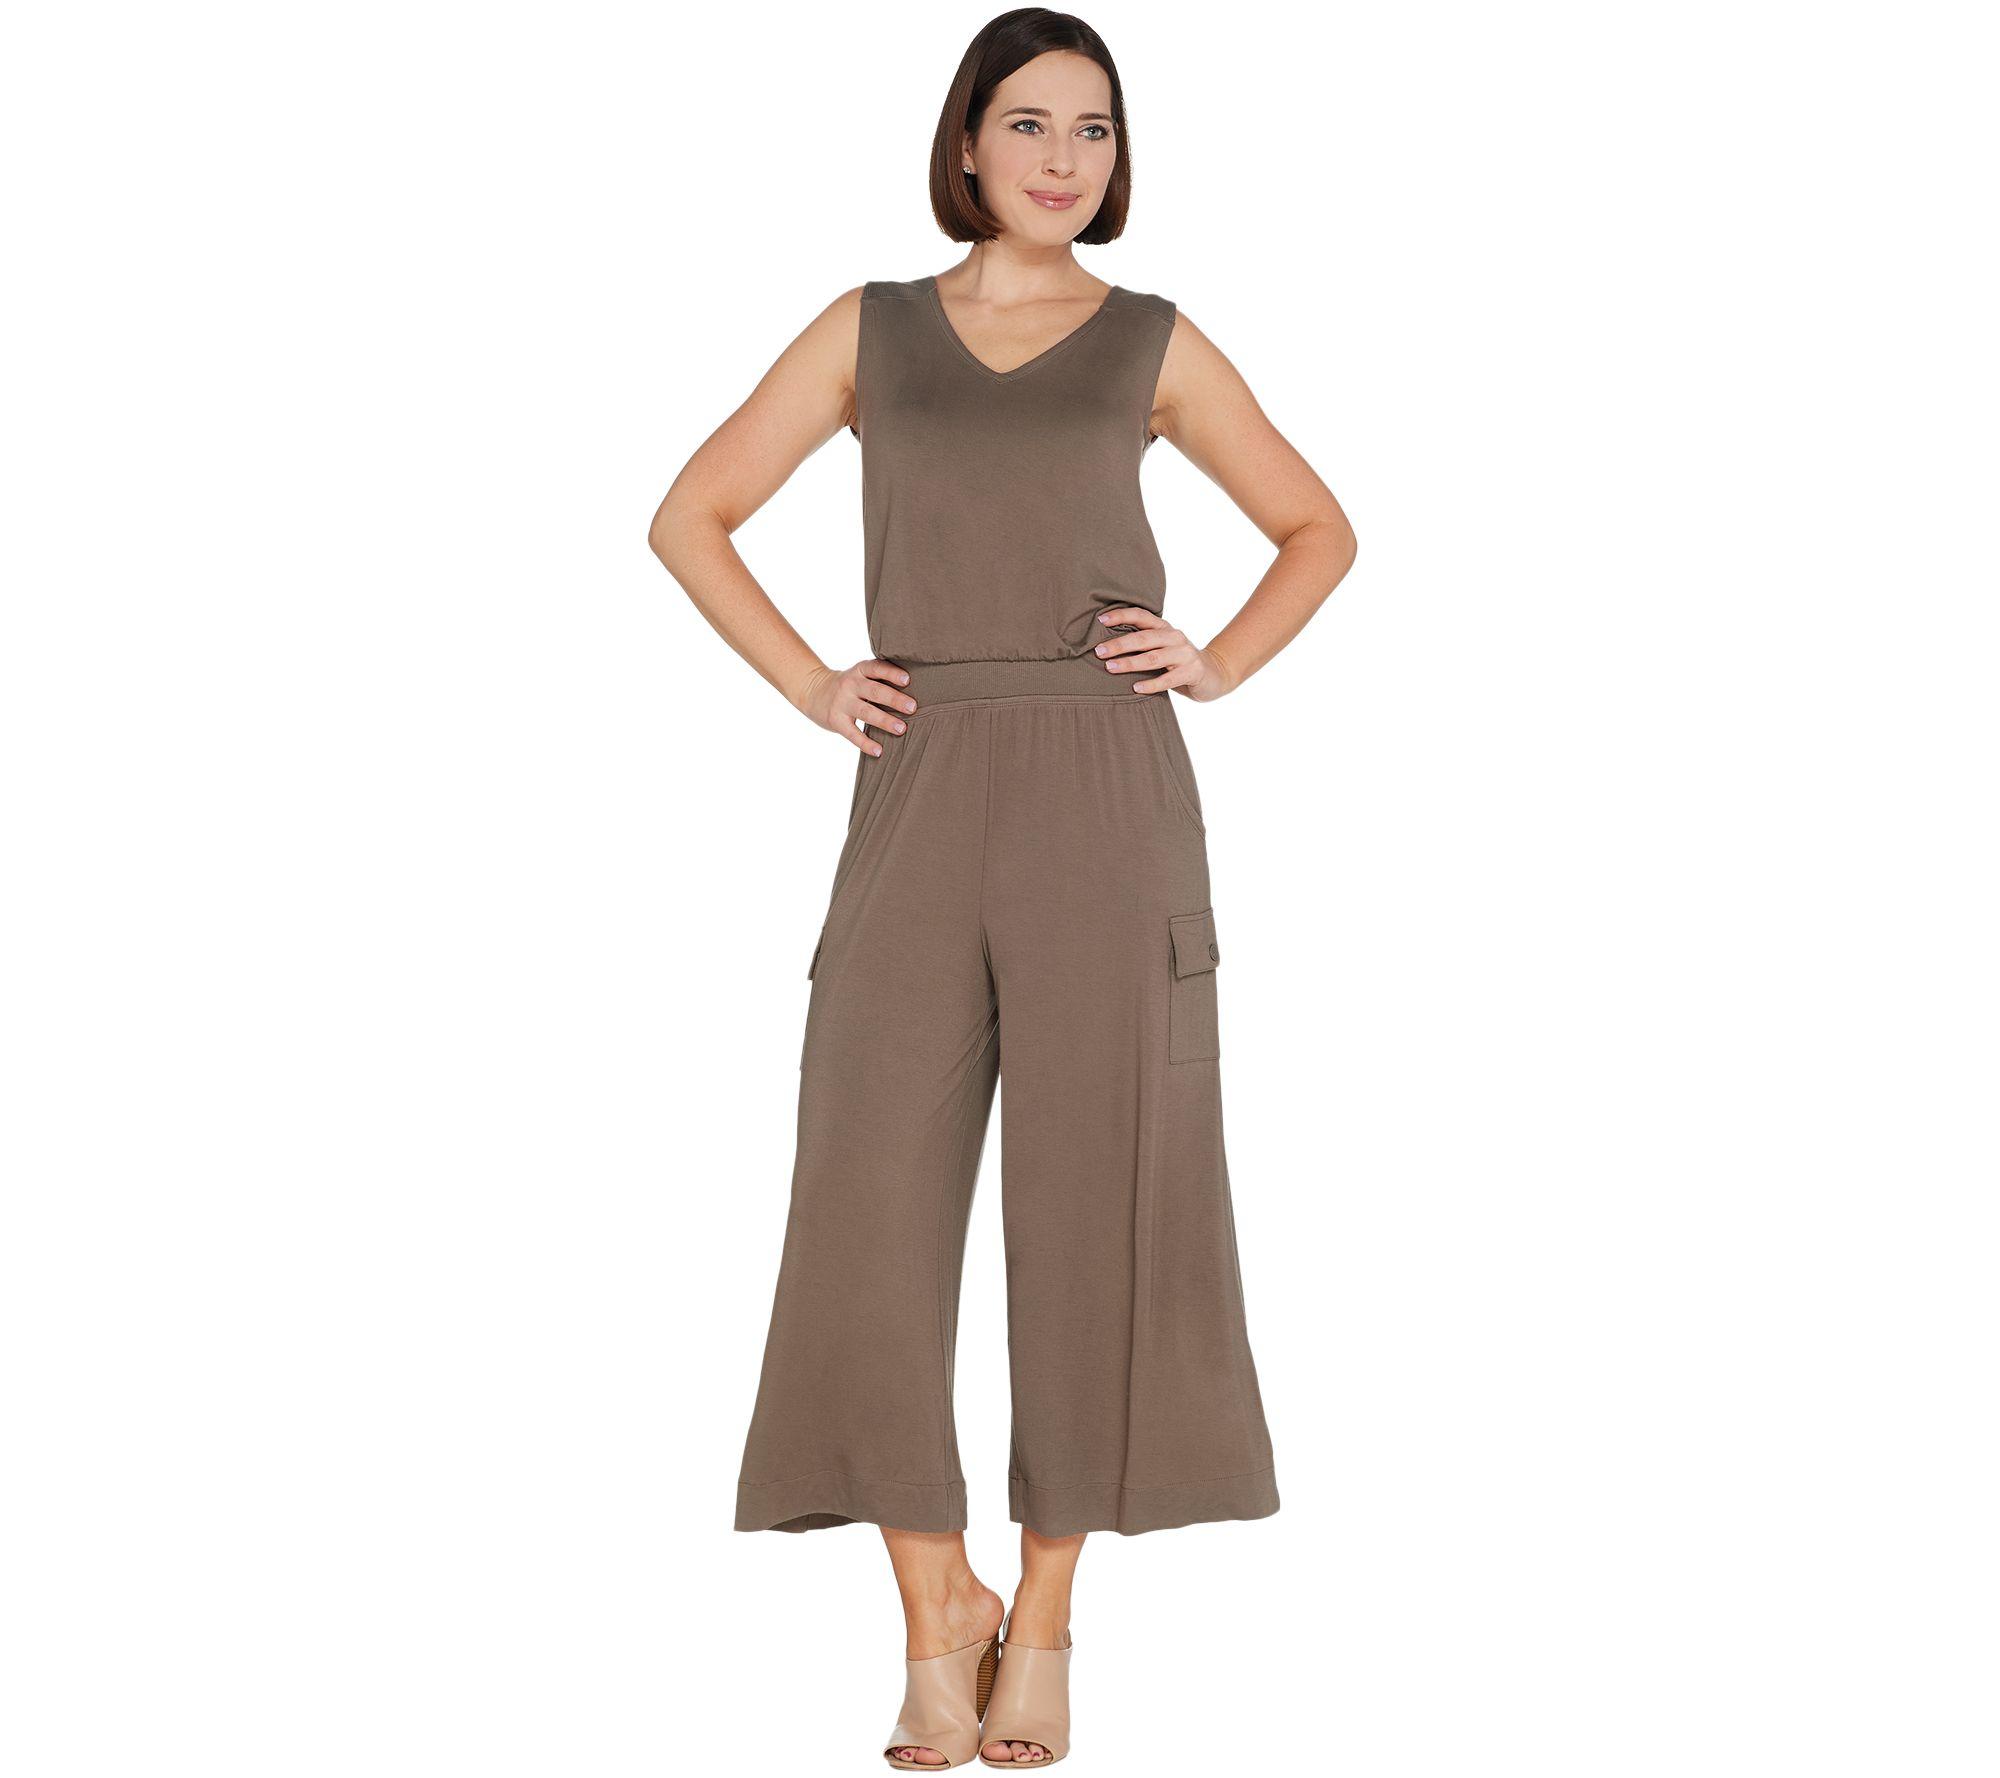 6e1b9e8548ac Lisa Rinna Collection Jumpsuit - Page 1 — QVC.com